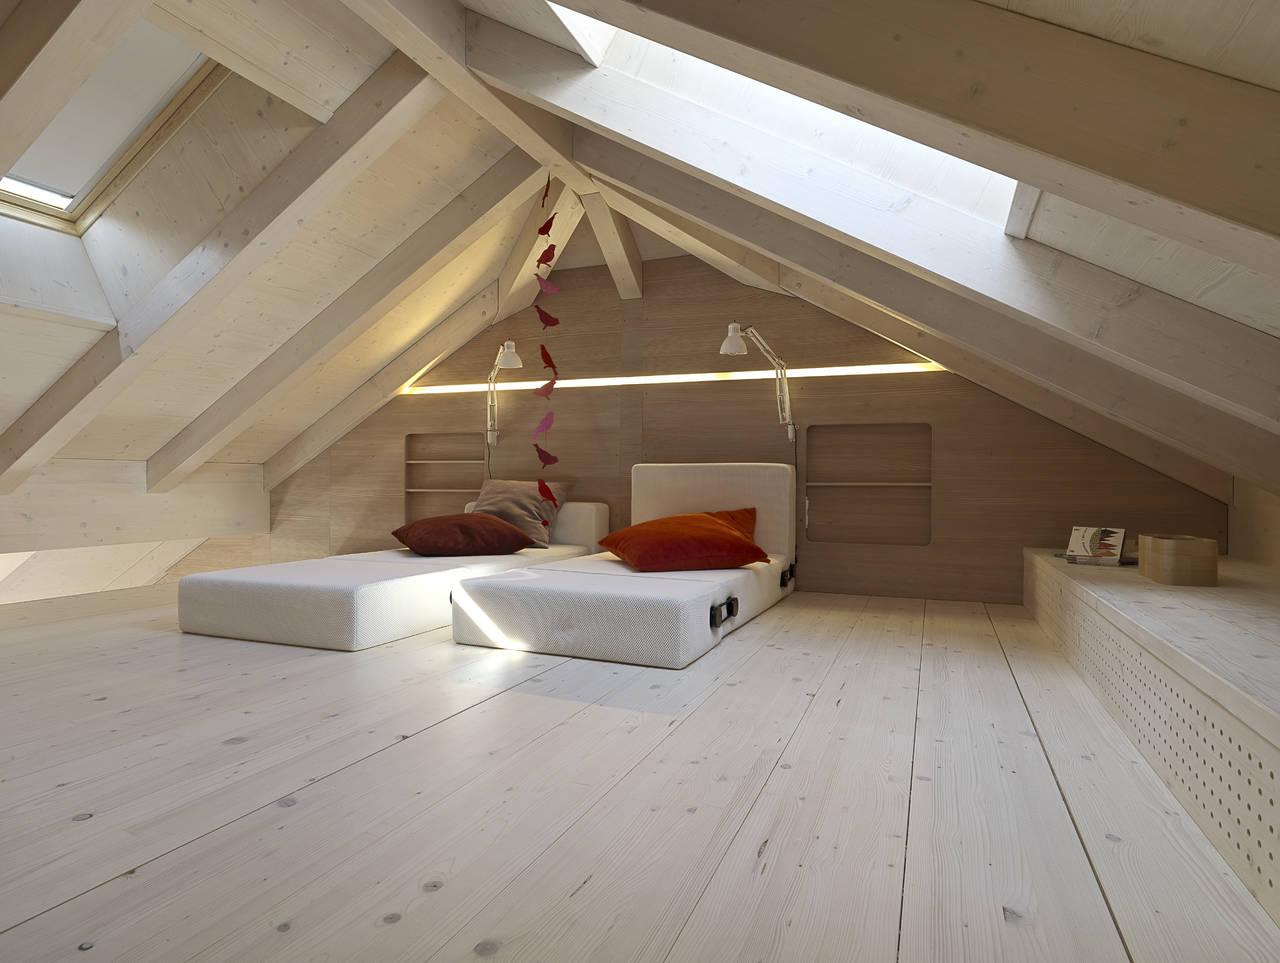 Una casa per le vacanze in mansarda - Casa legno moderna ...